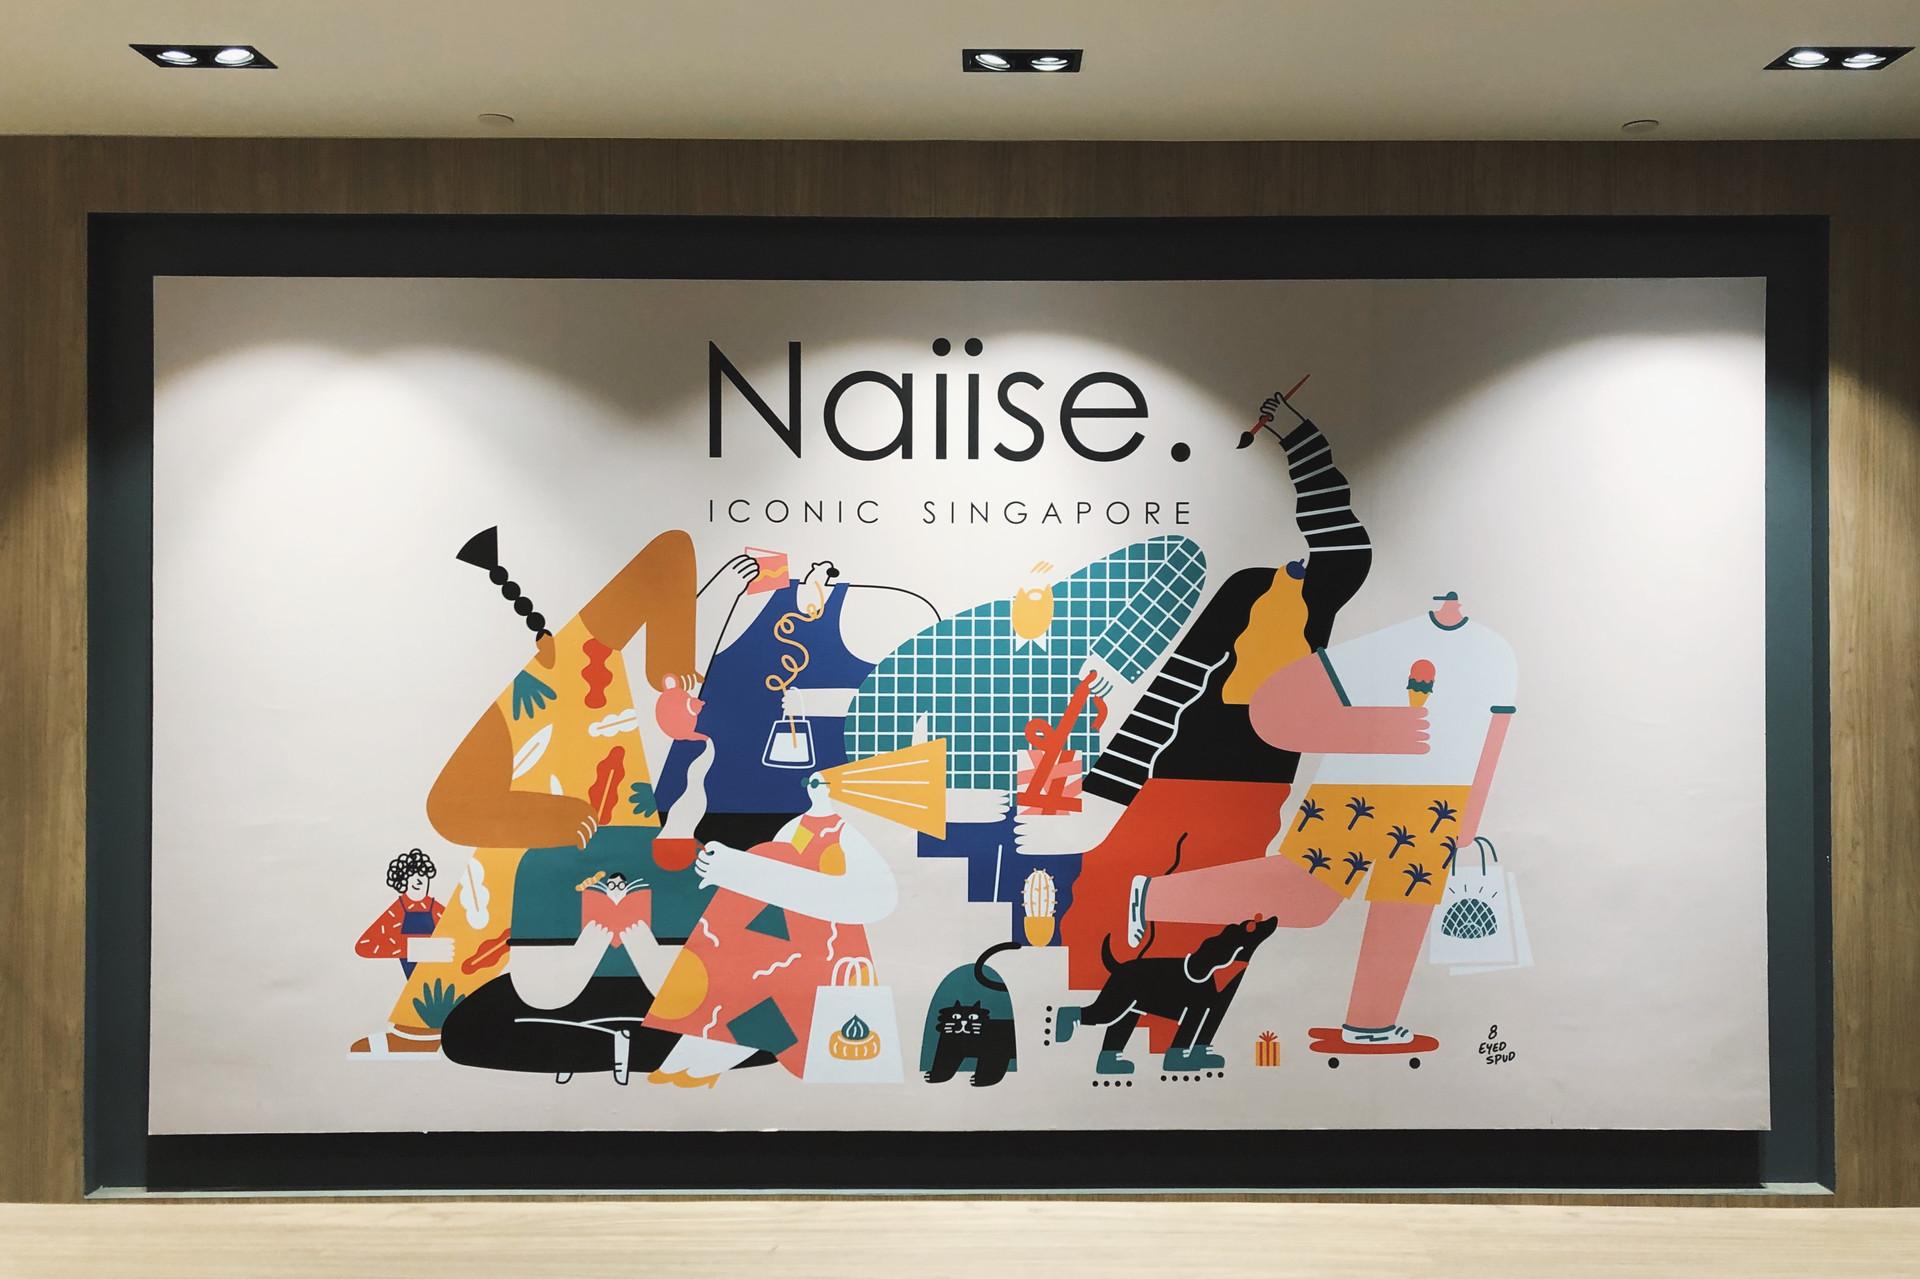 8ES_Naiise-Mural.JPG